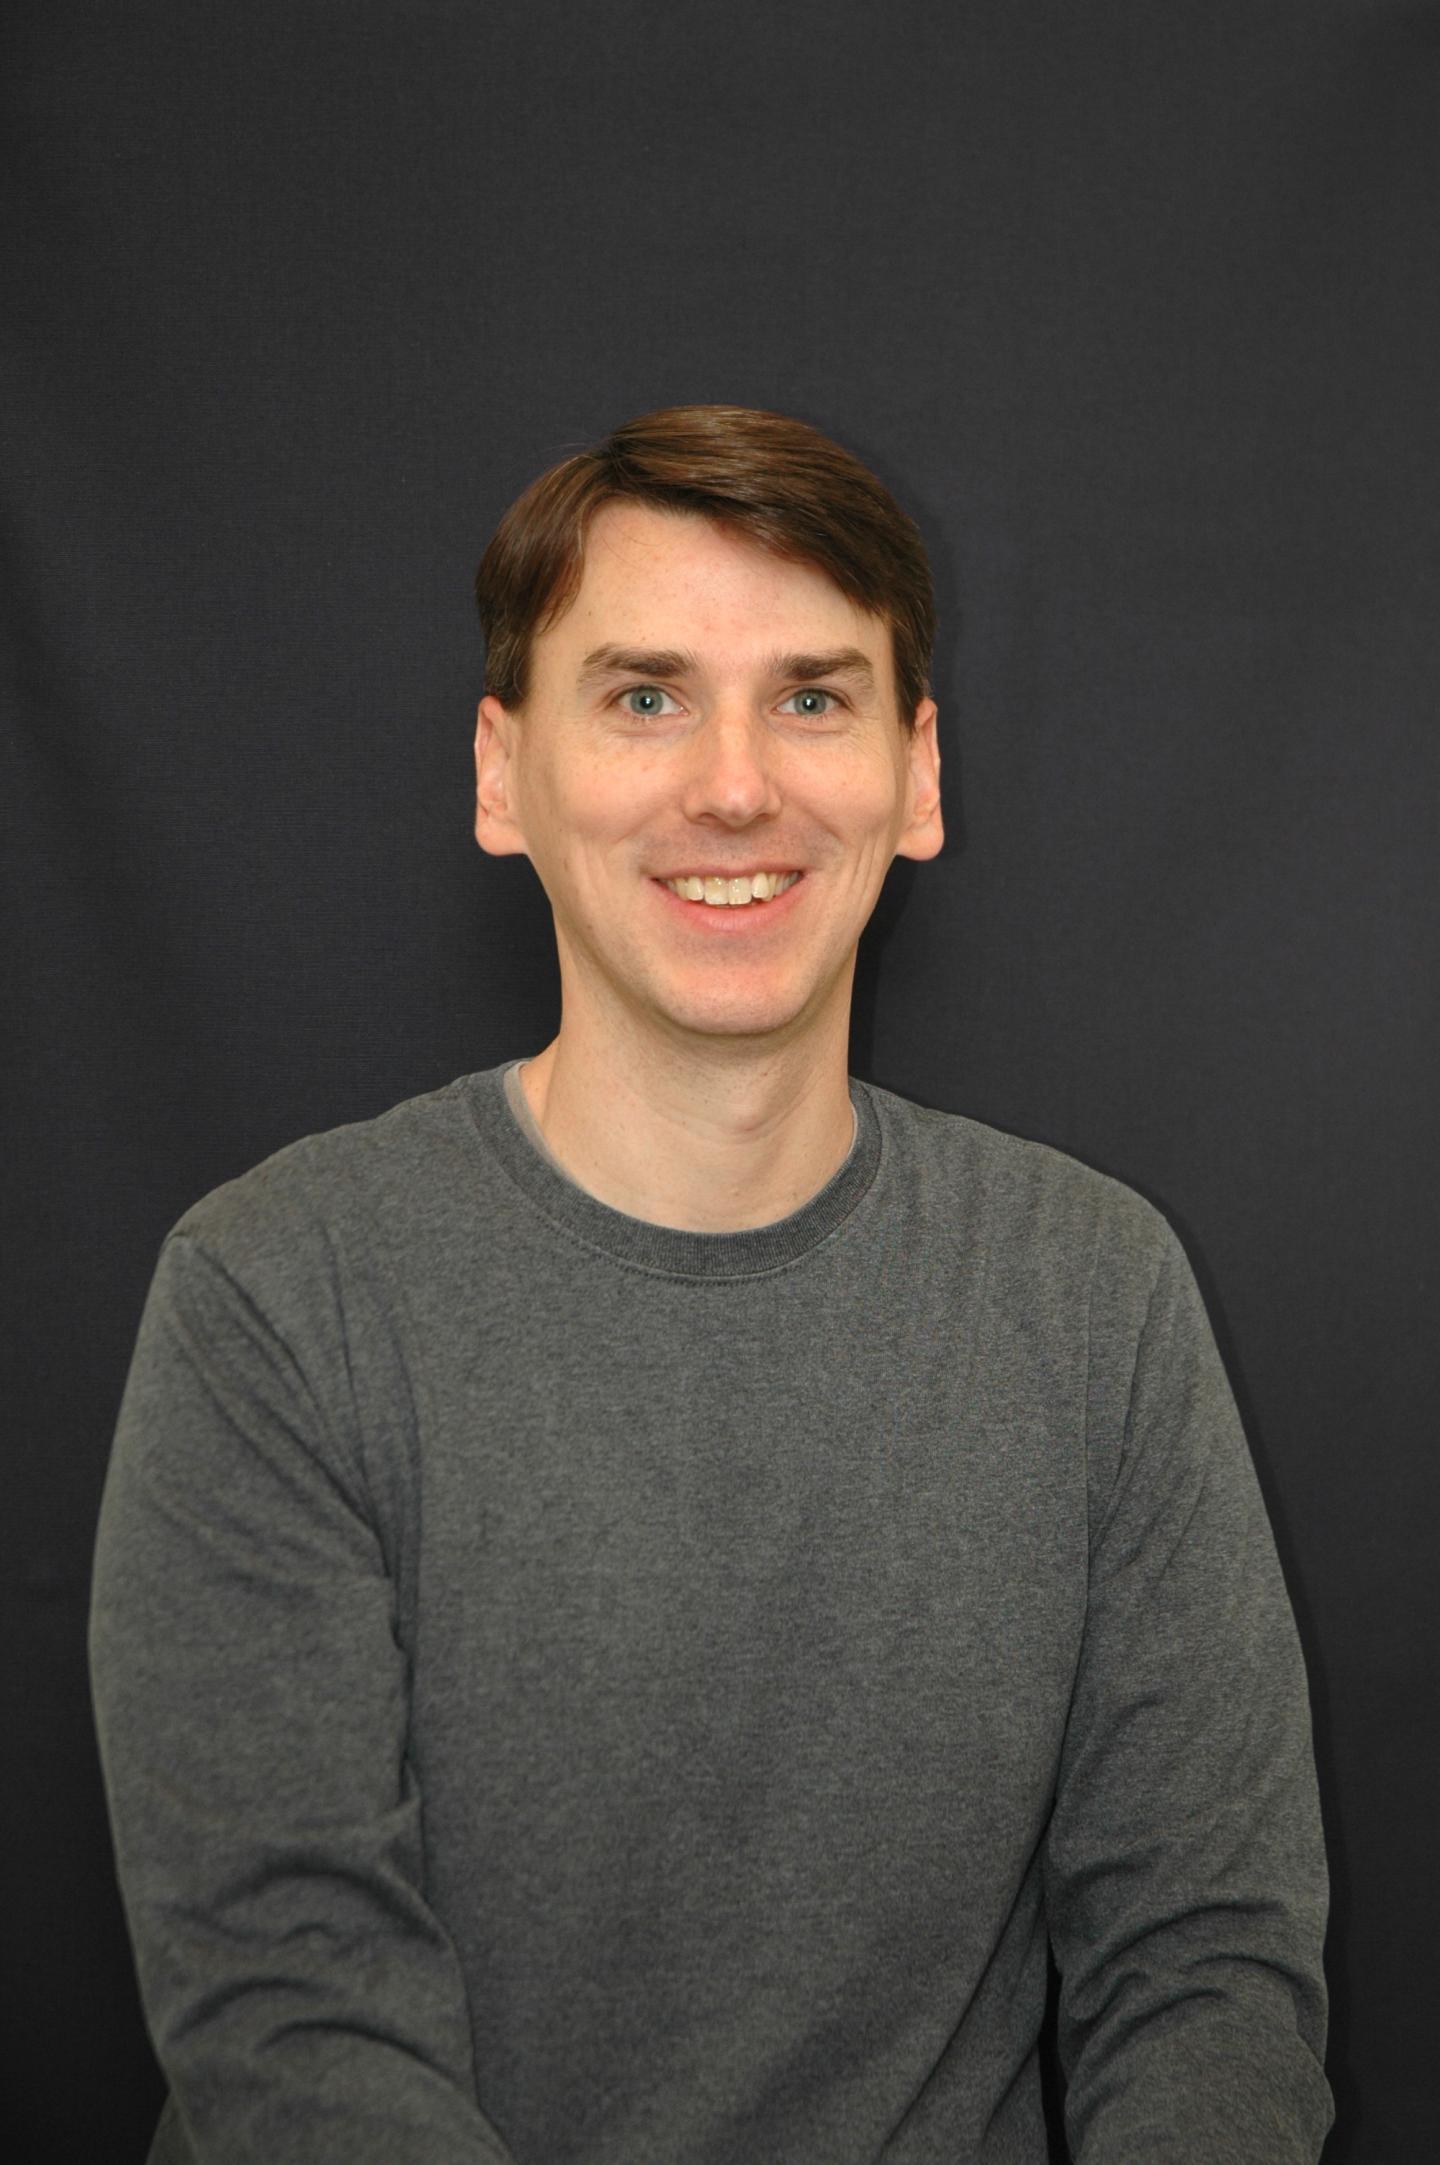 Jeffrey Starns, University of Massachusetts at Amherst